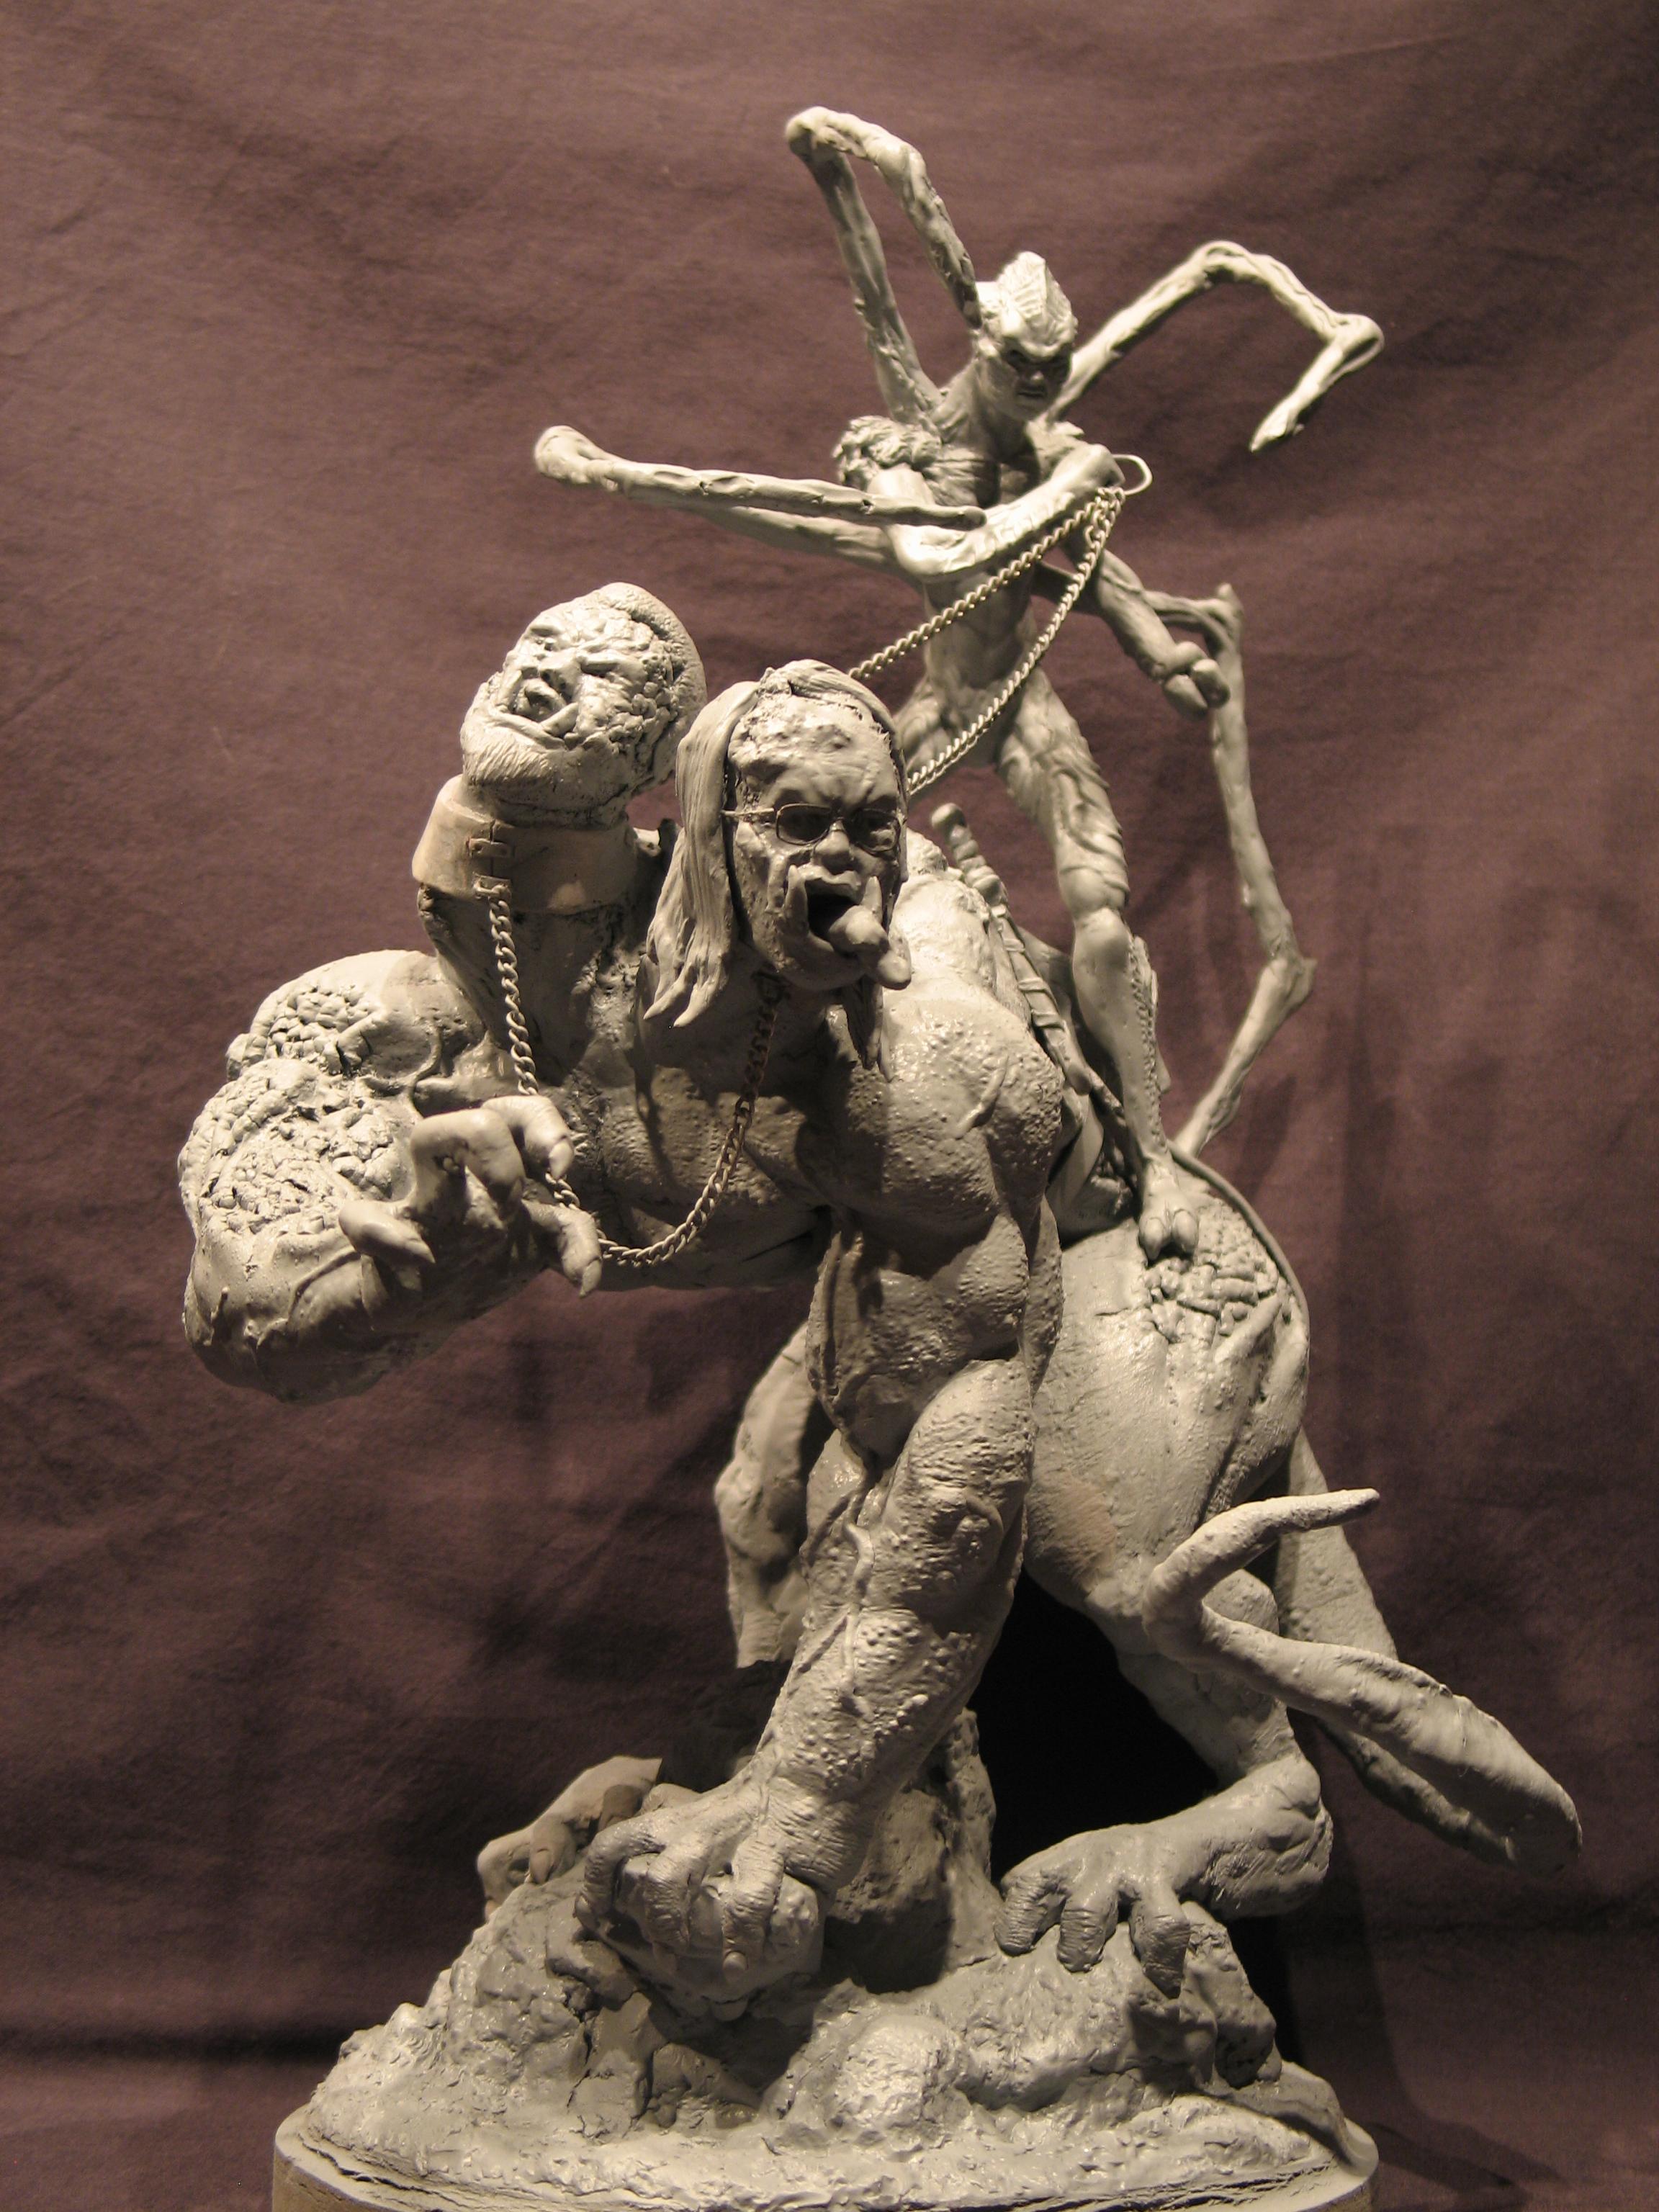 Spiderzero Riding the Shiflett Monster (Concours Shiflett 2) S134d